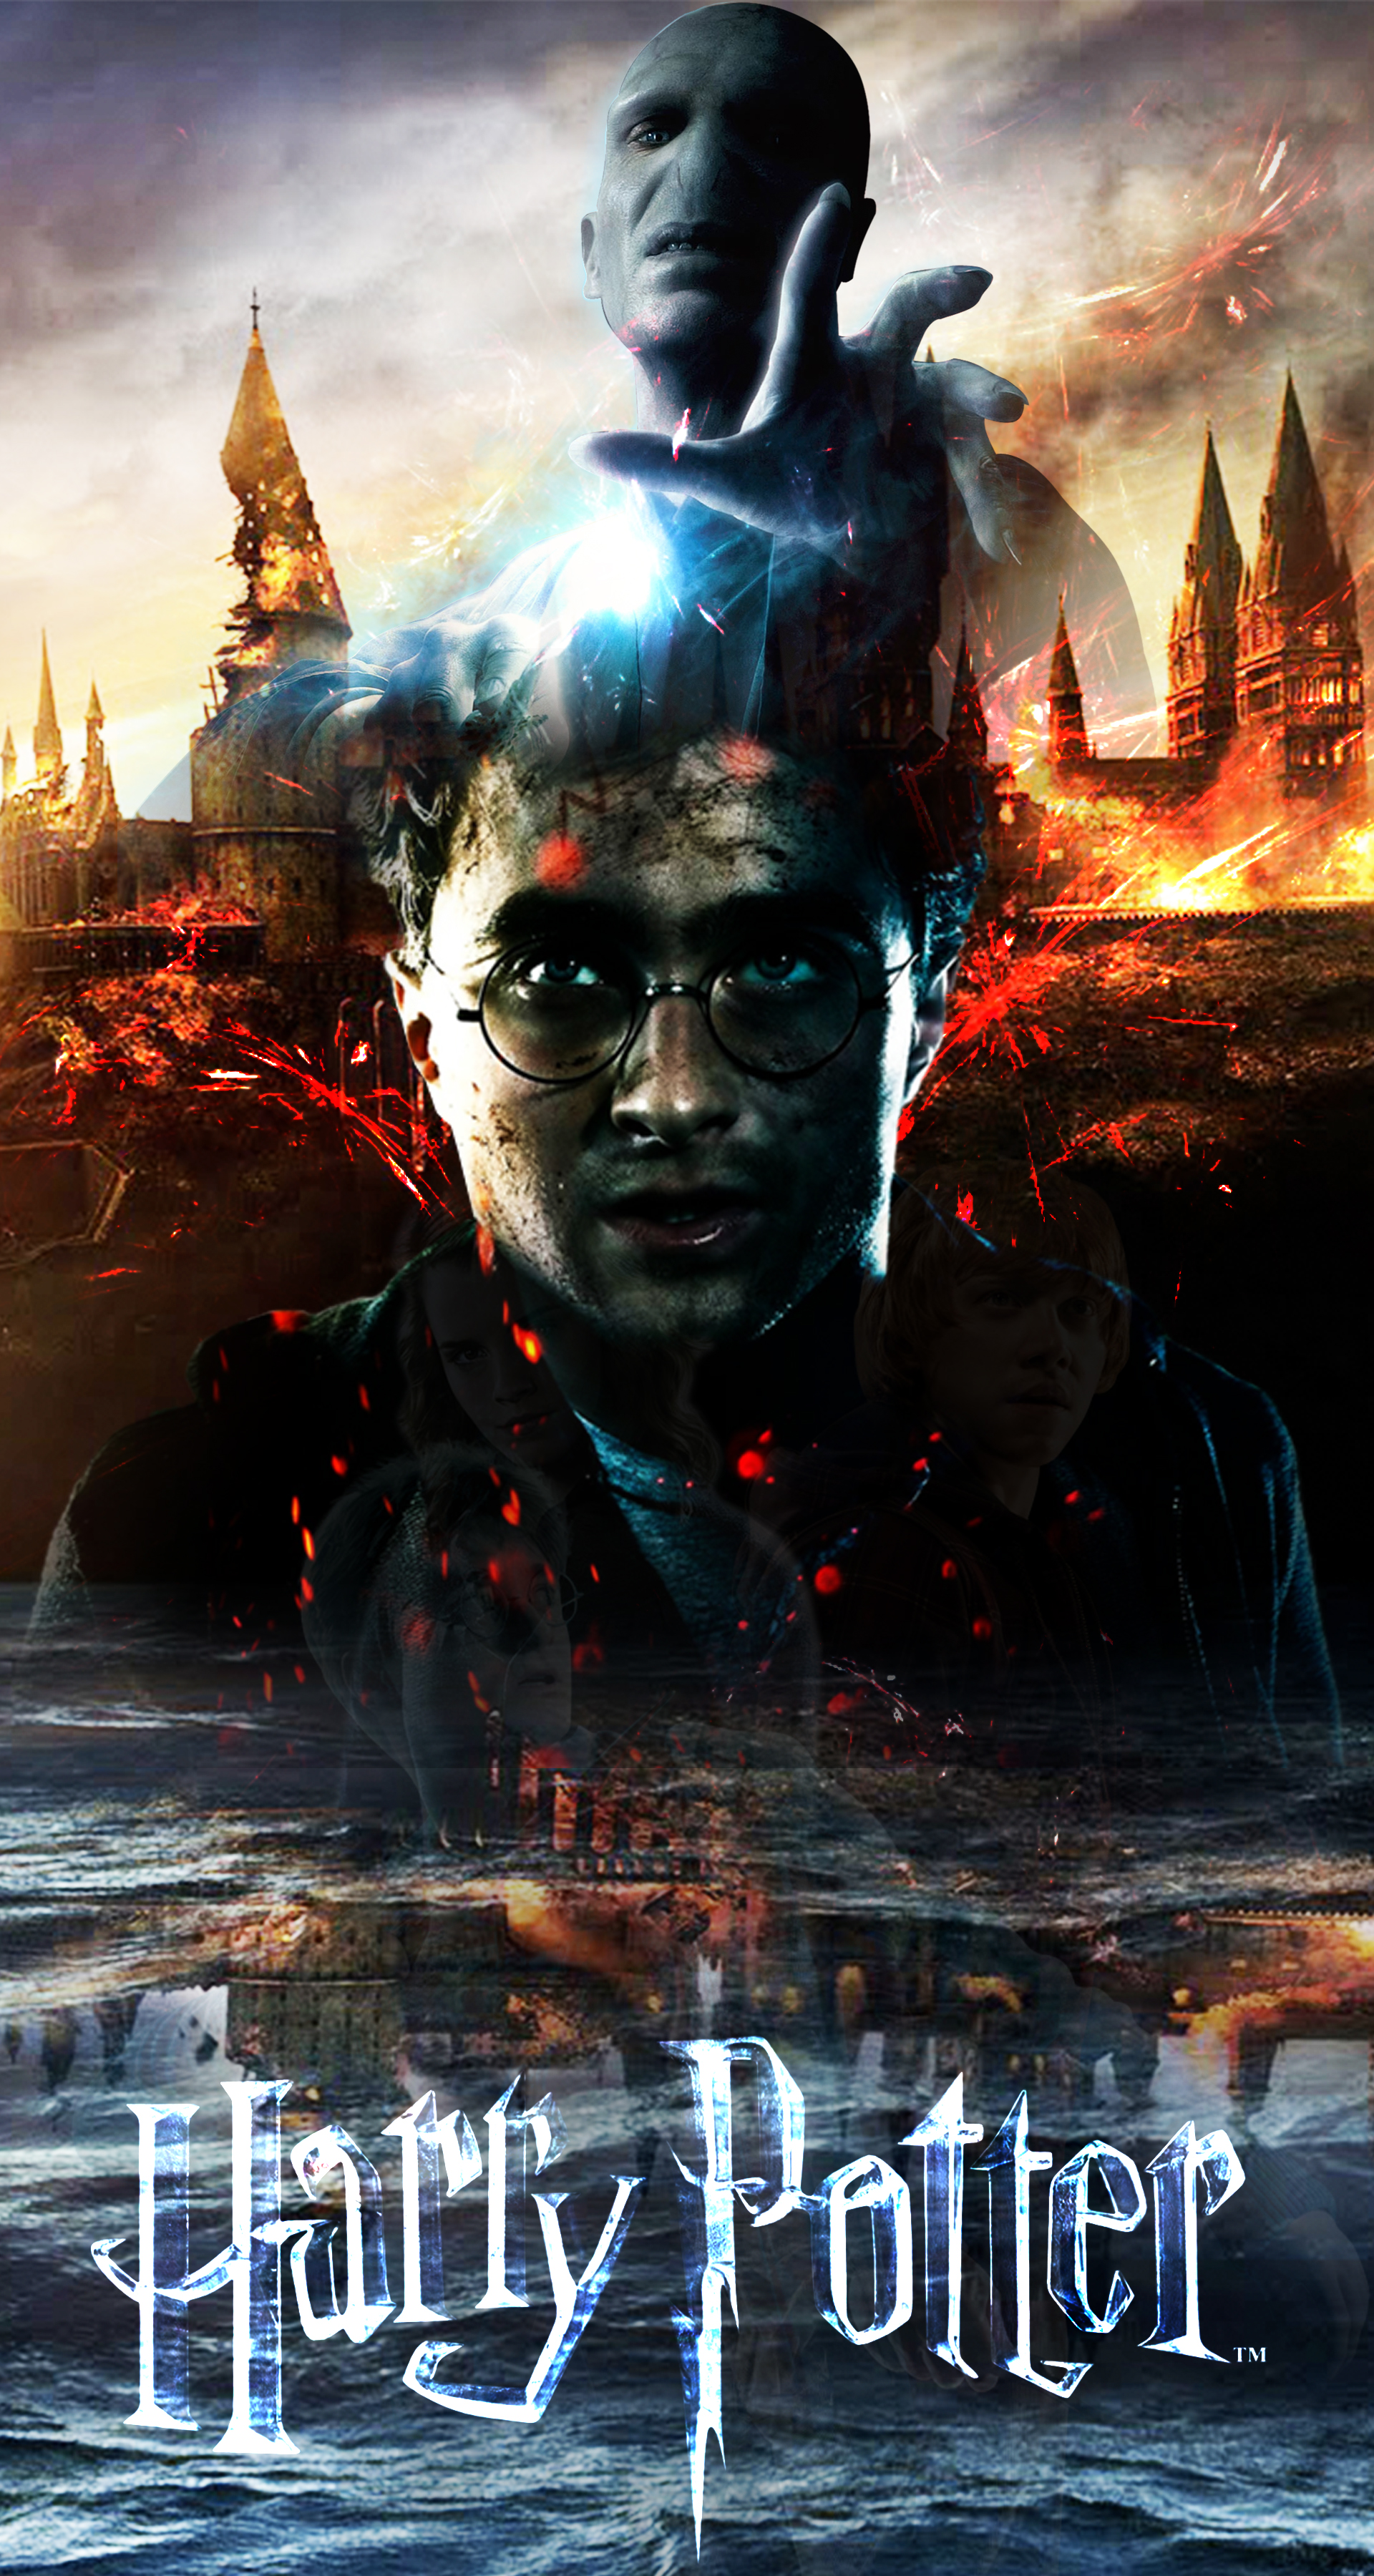 Harry Potter Wallpaper. by Germanwallpaper on DeviantArt